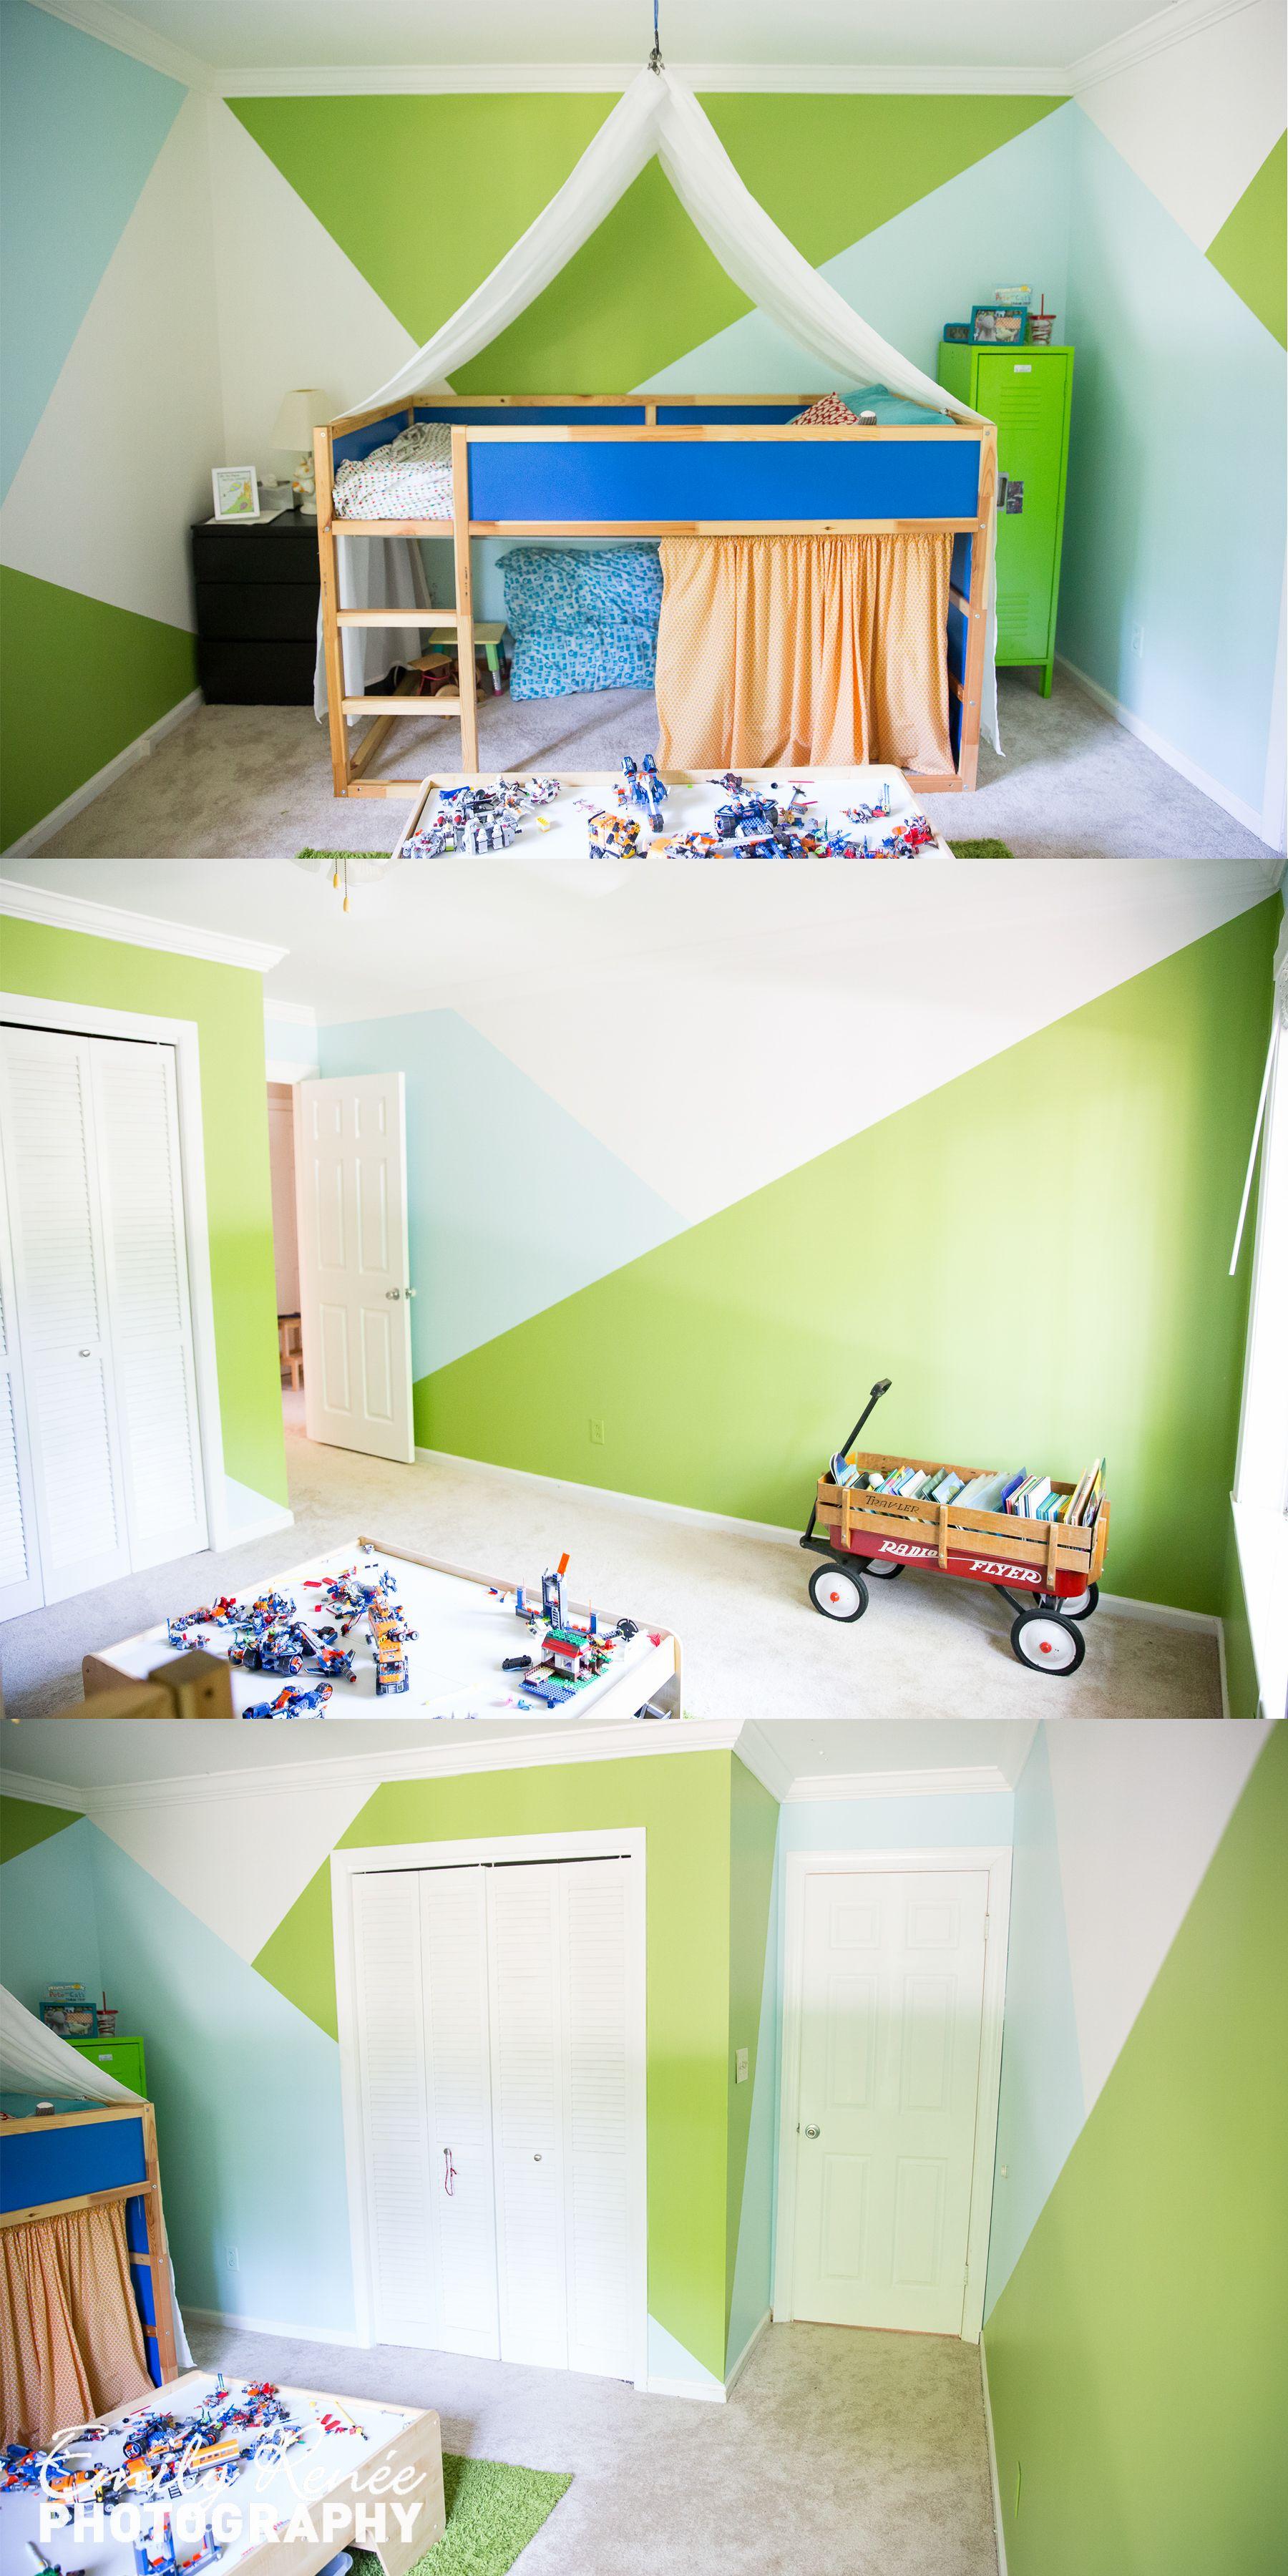 Loft bed with desk blue  Geometric paint kidus room green blue and white room Ikea Kura